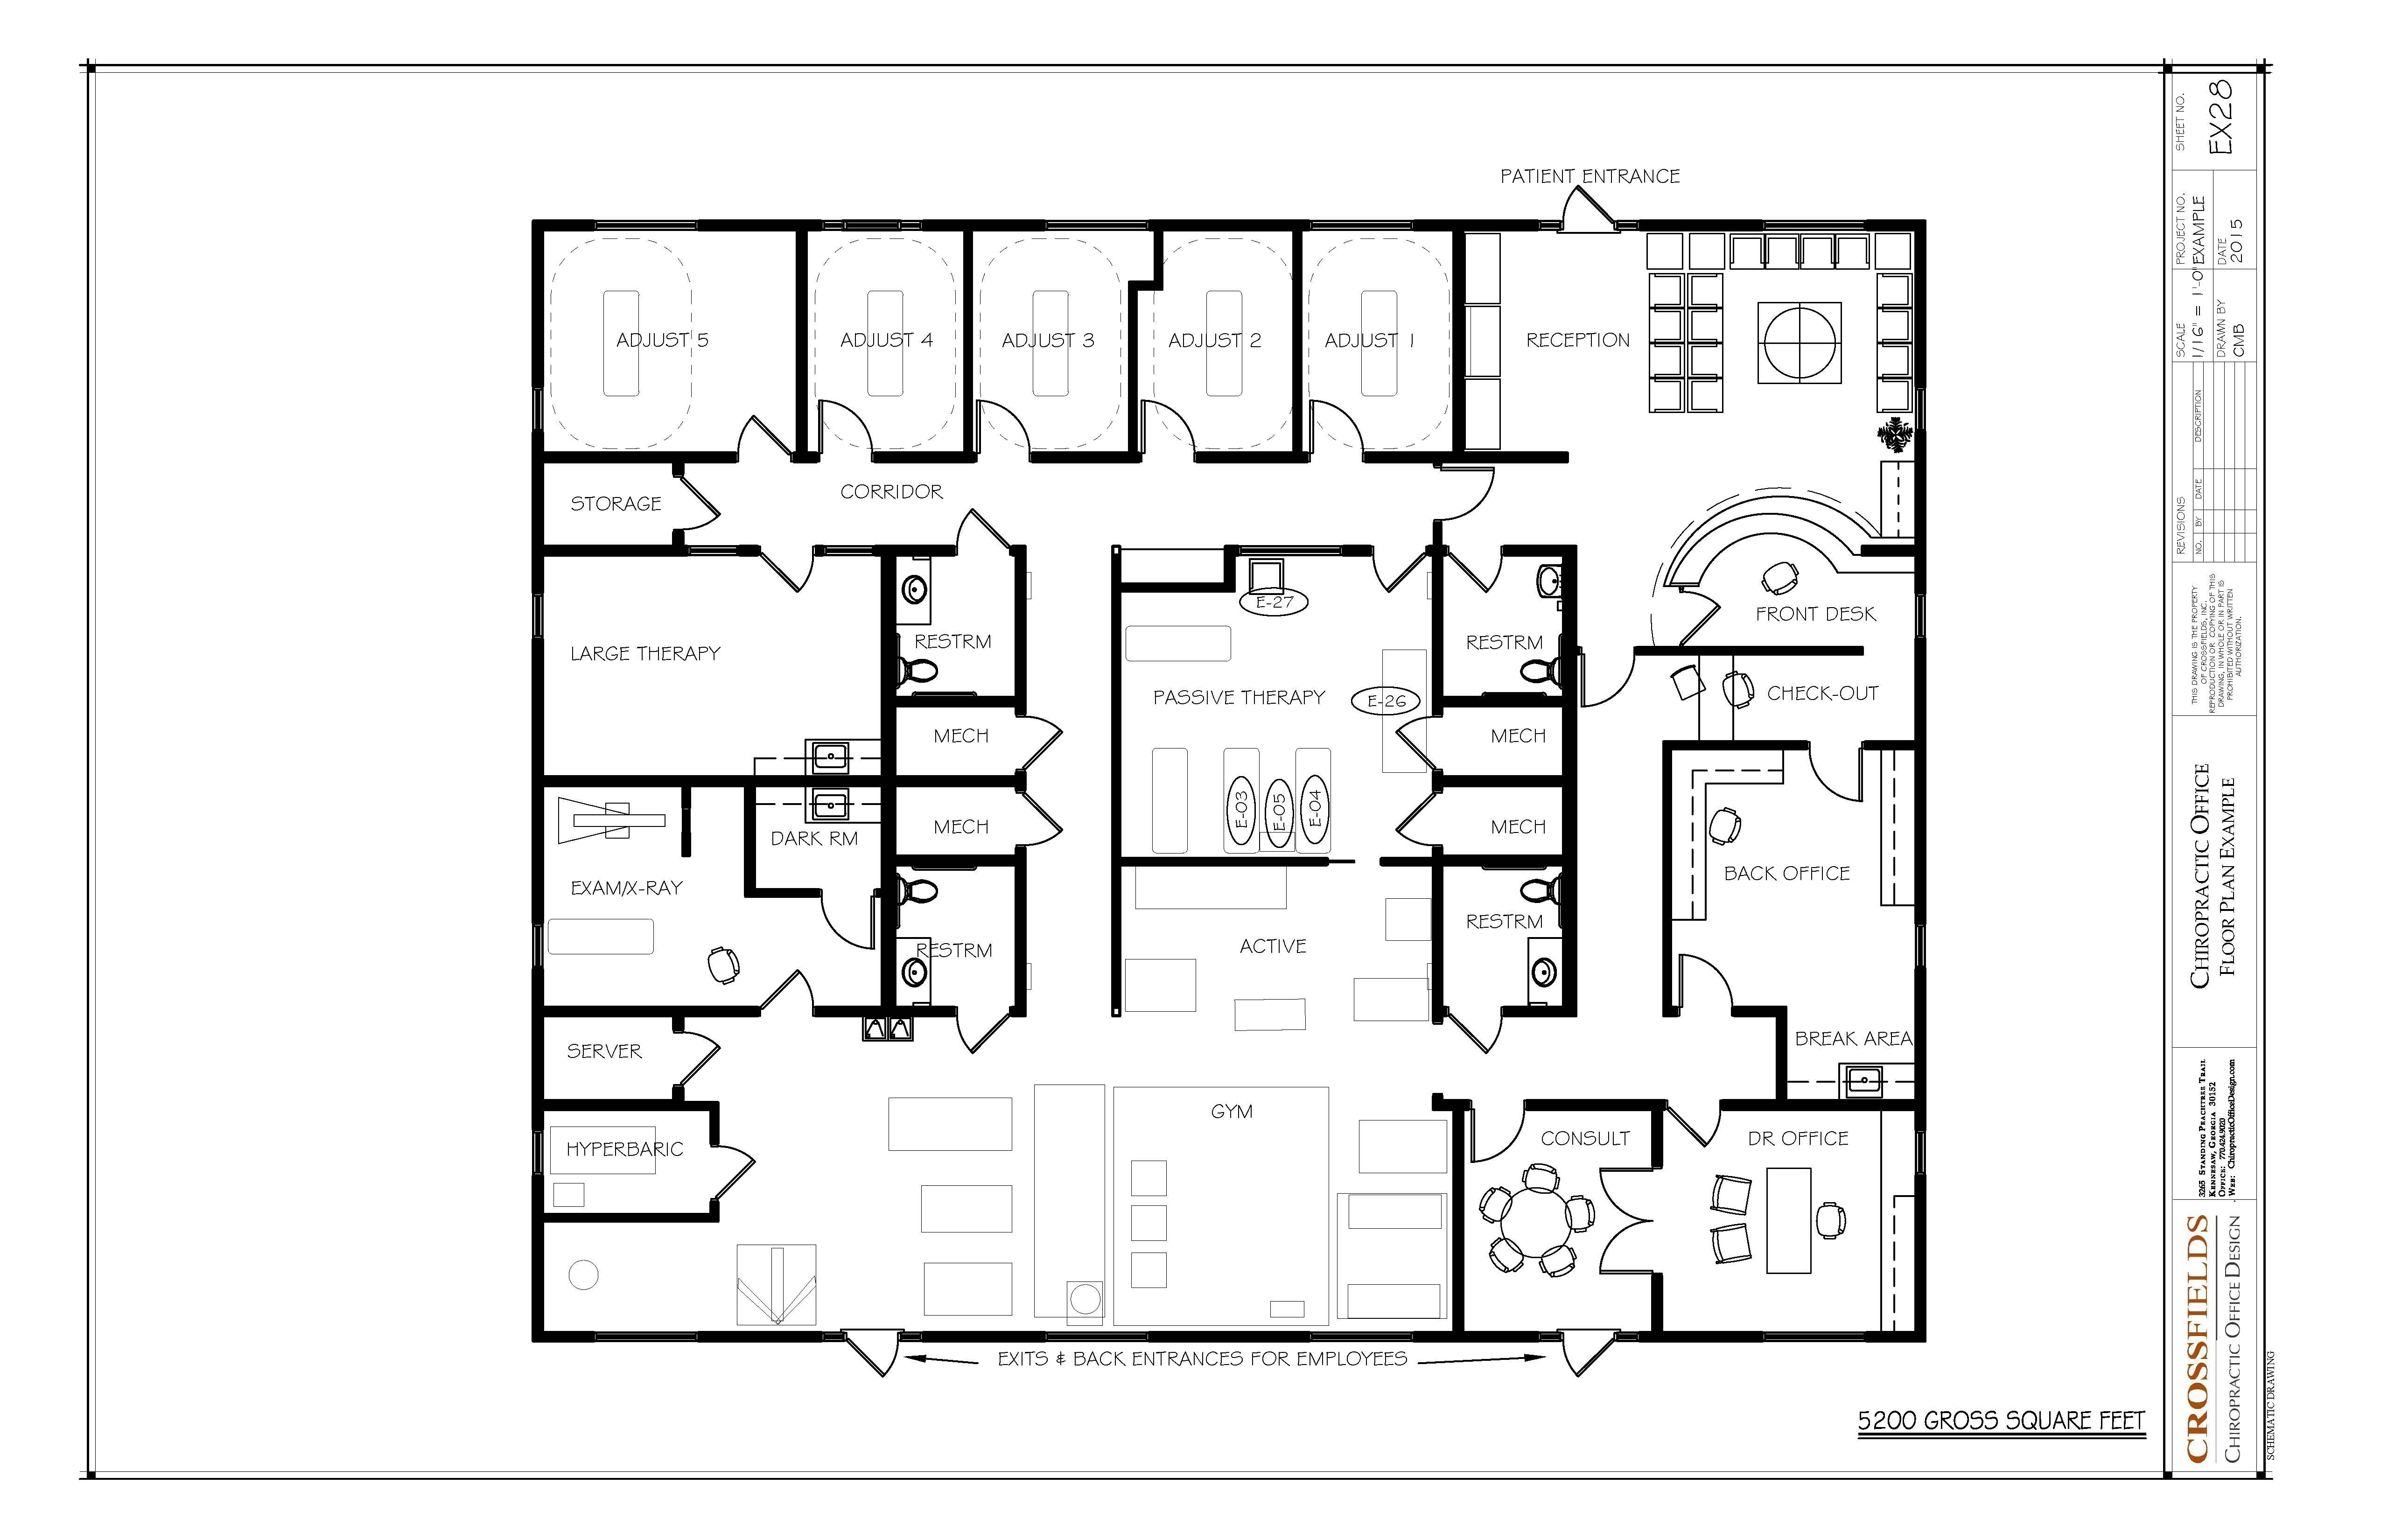 office floor plan layout. #Chiropractic Office #Floorplan #layout Chiropractic With Hyperbaric And X-Ray Floor Plan Layout I